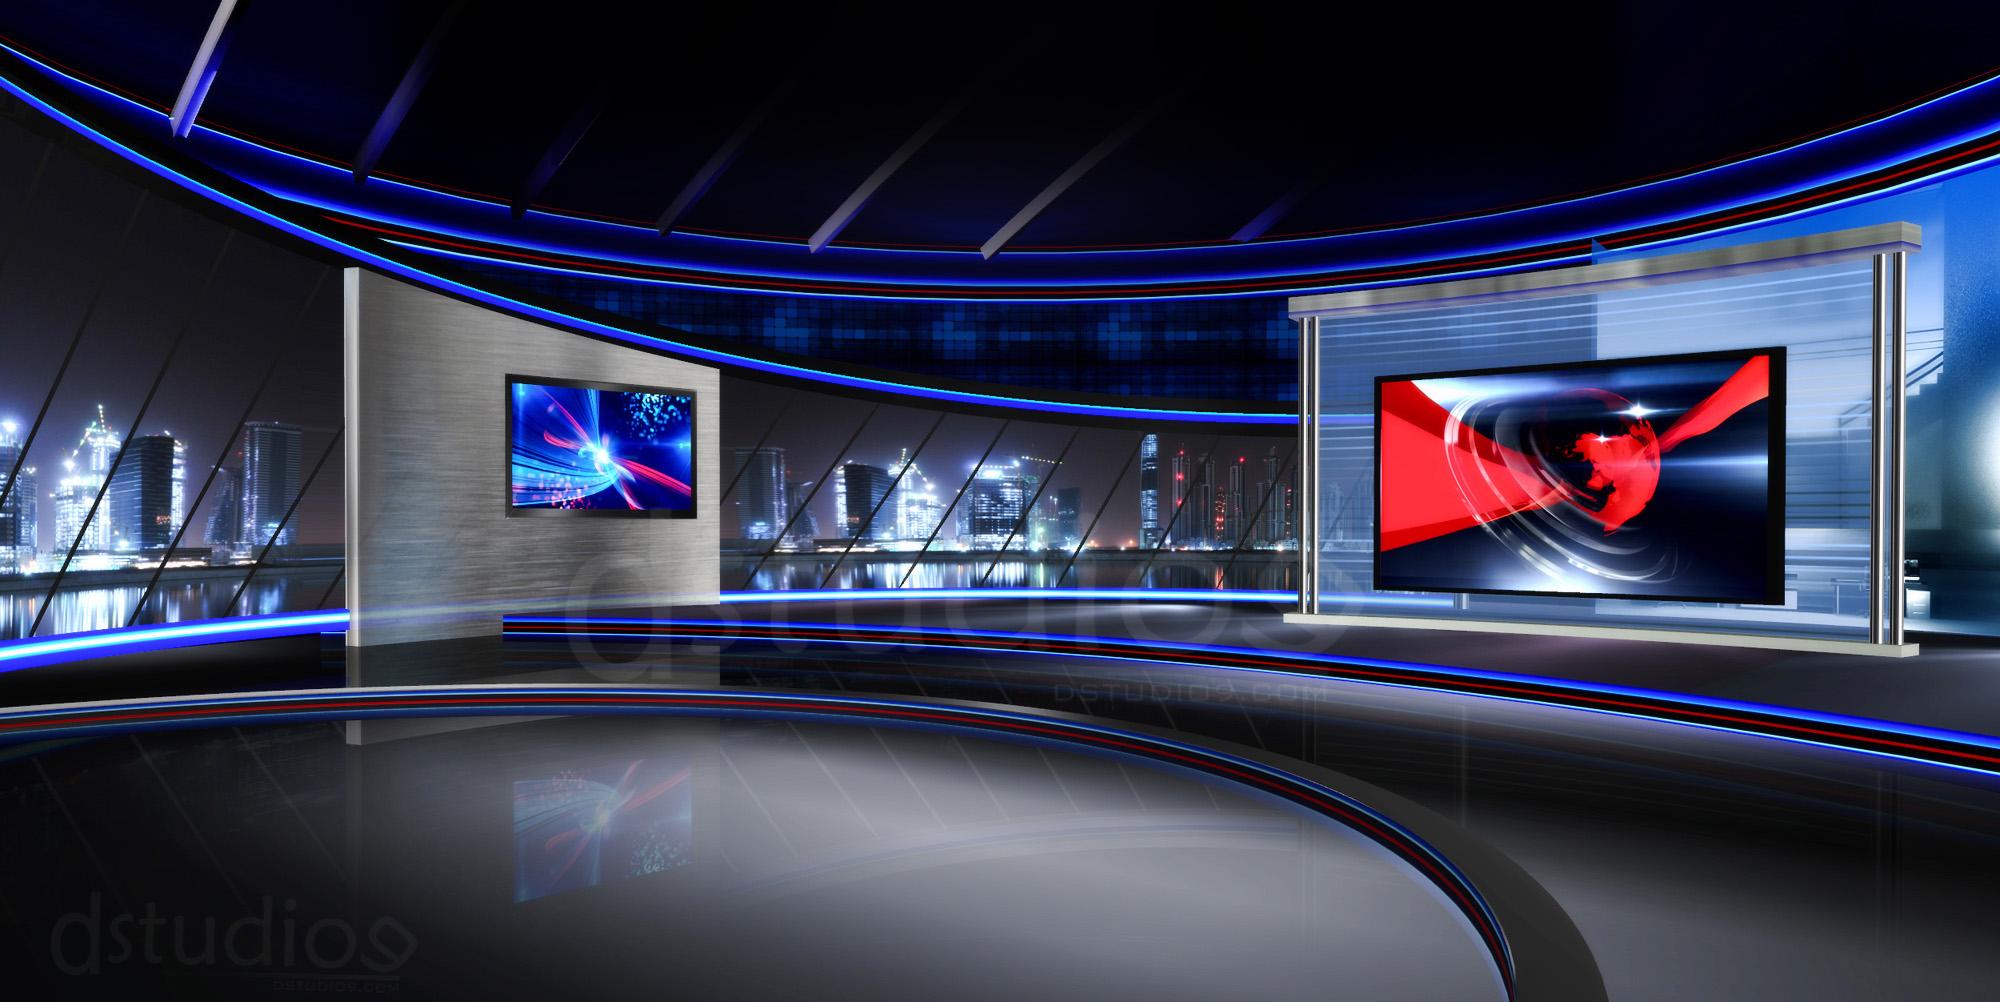 News Studio Background Free Download